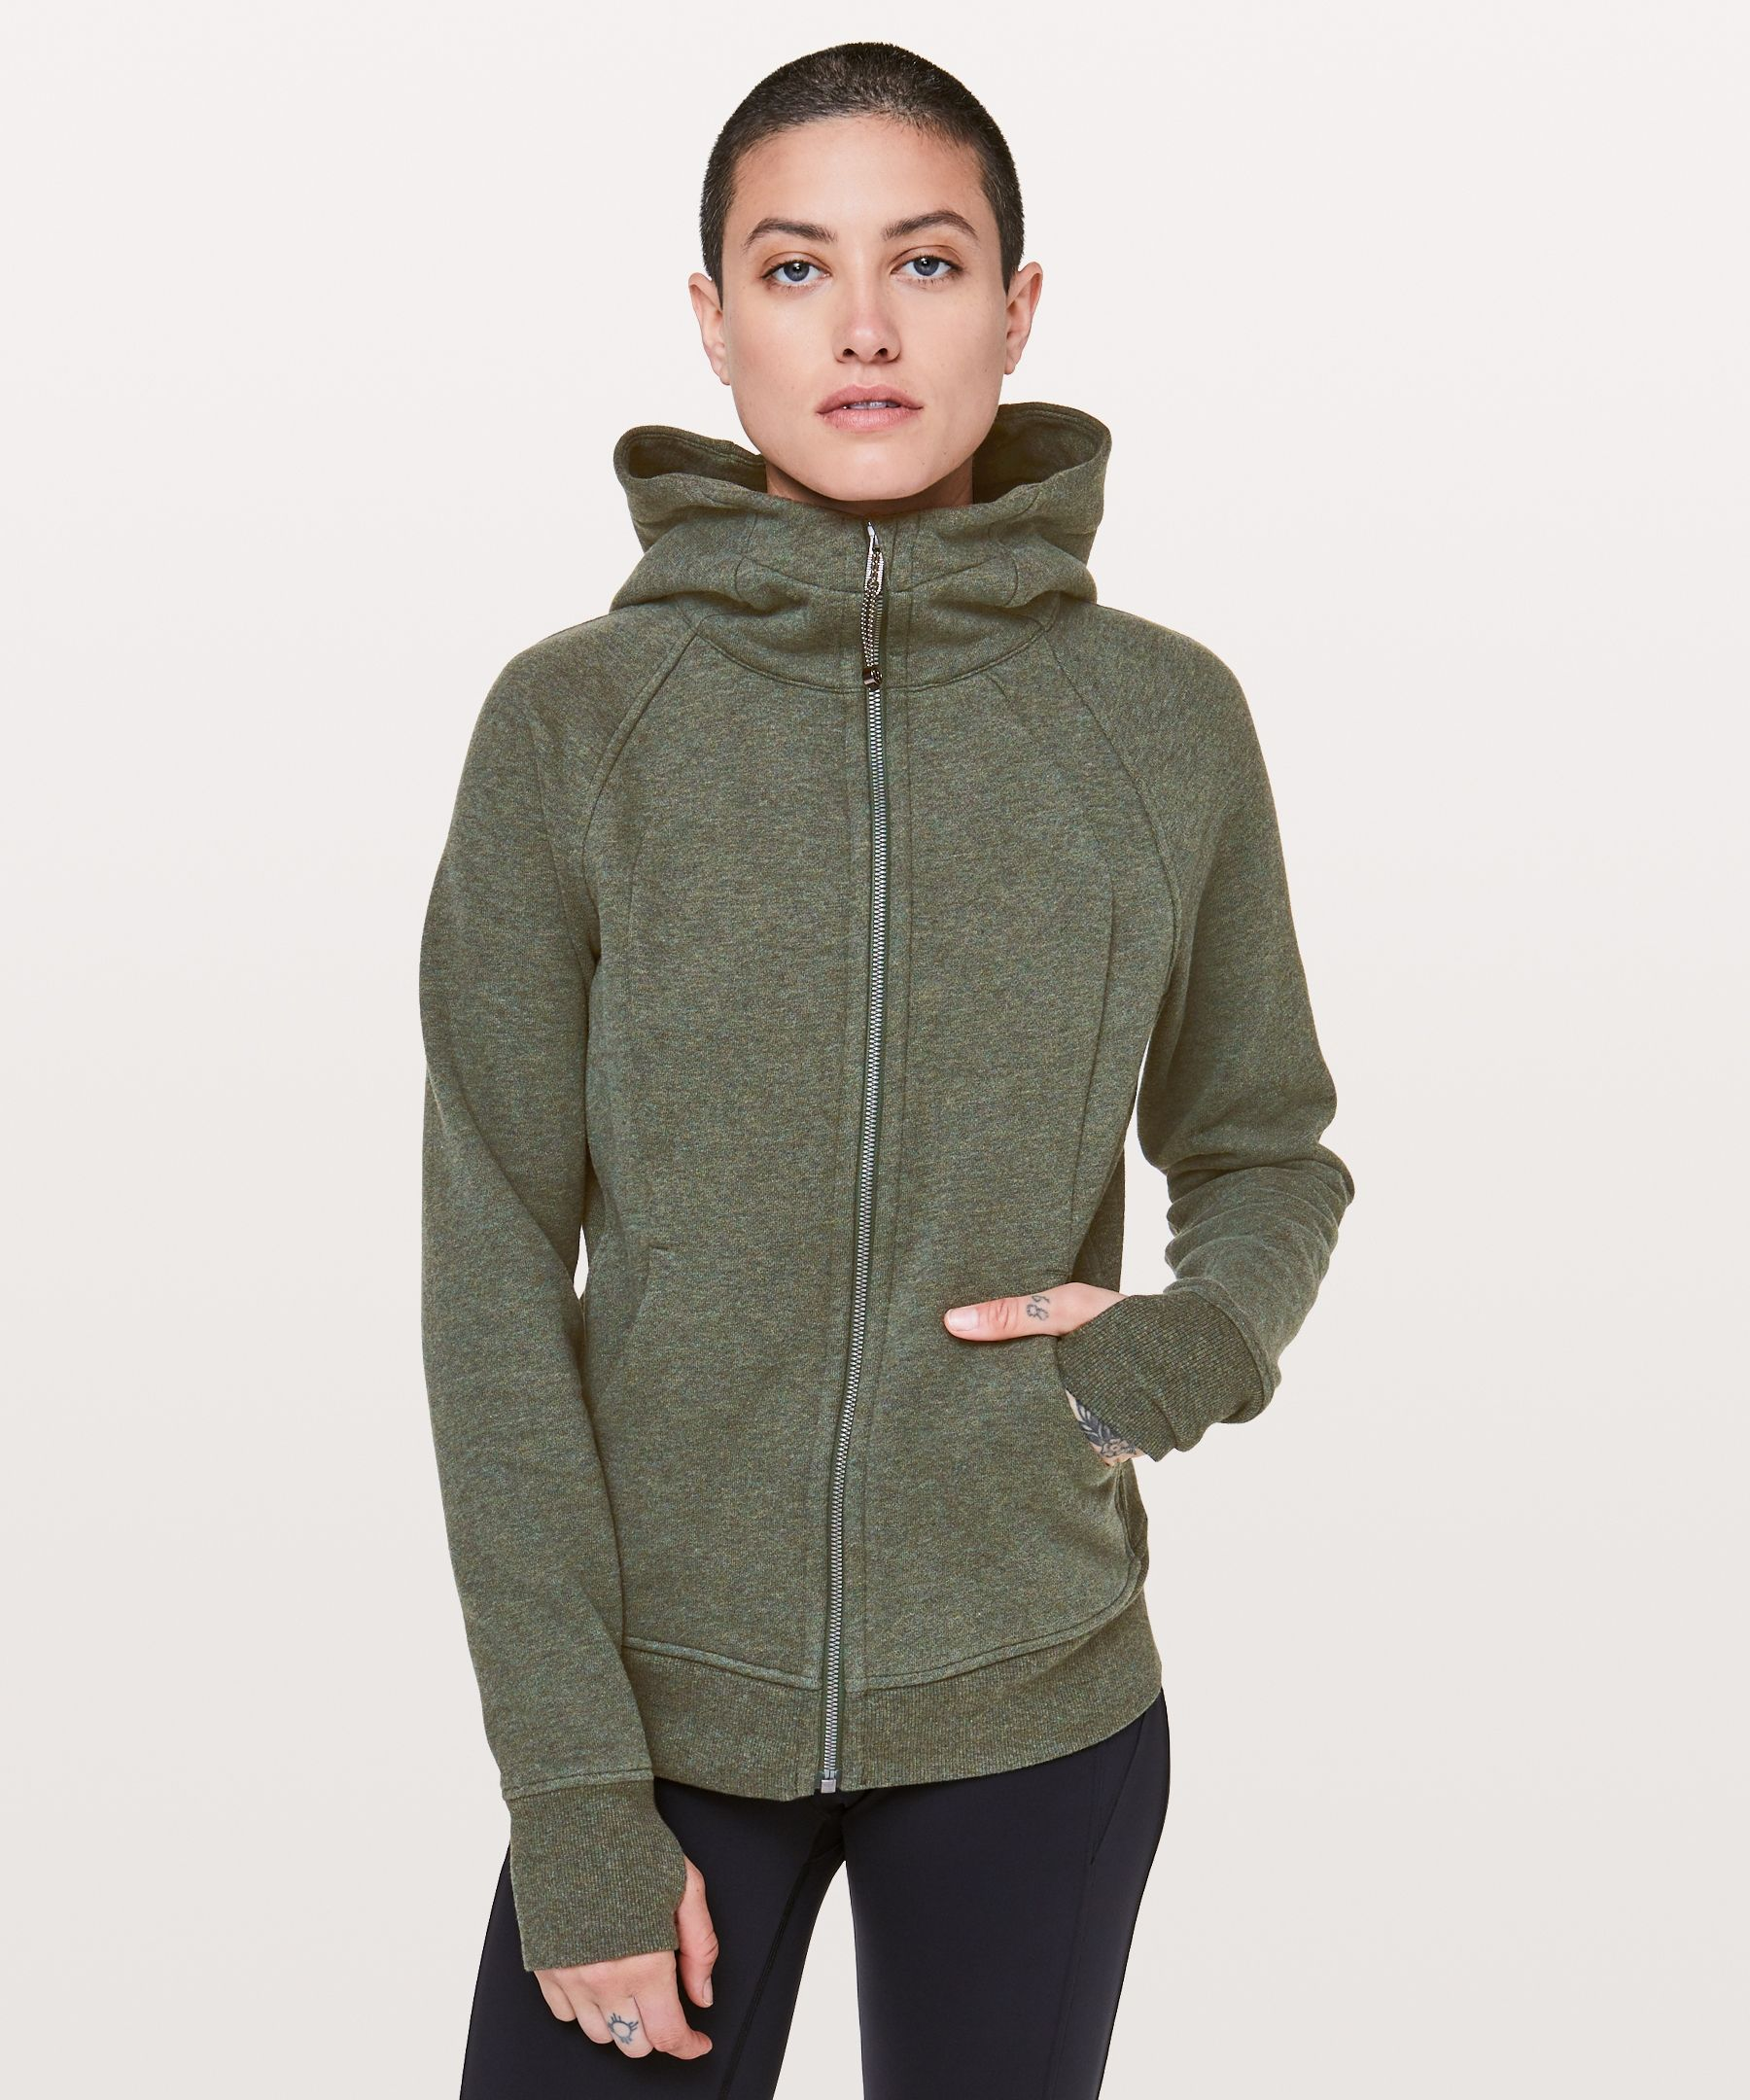 2b581a2e2abe Scuba Hoodie Light Cotton Fleece Heathered camo green